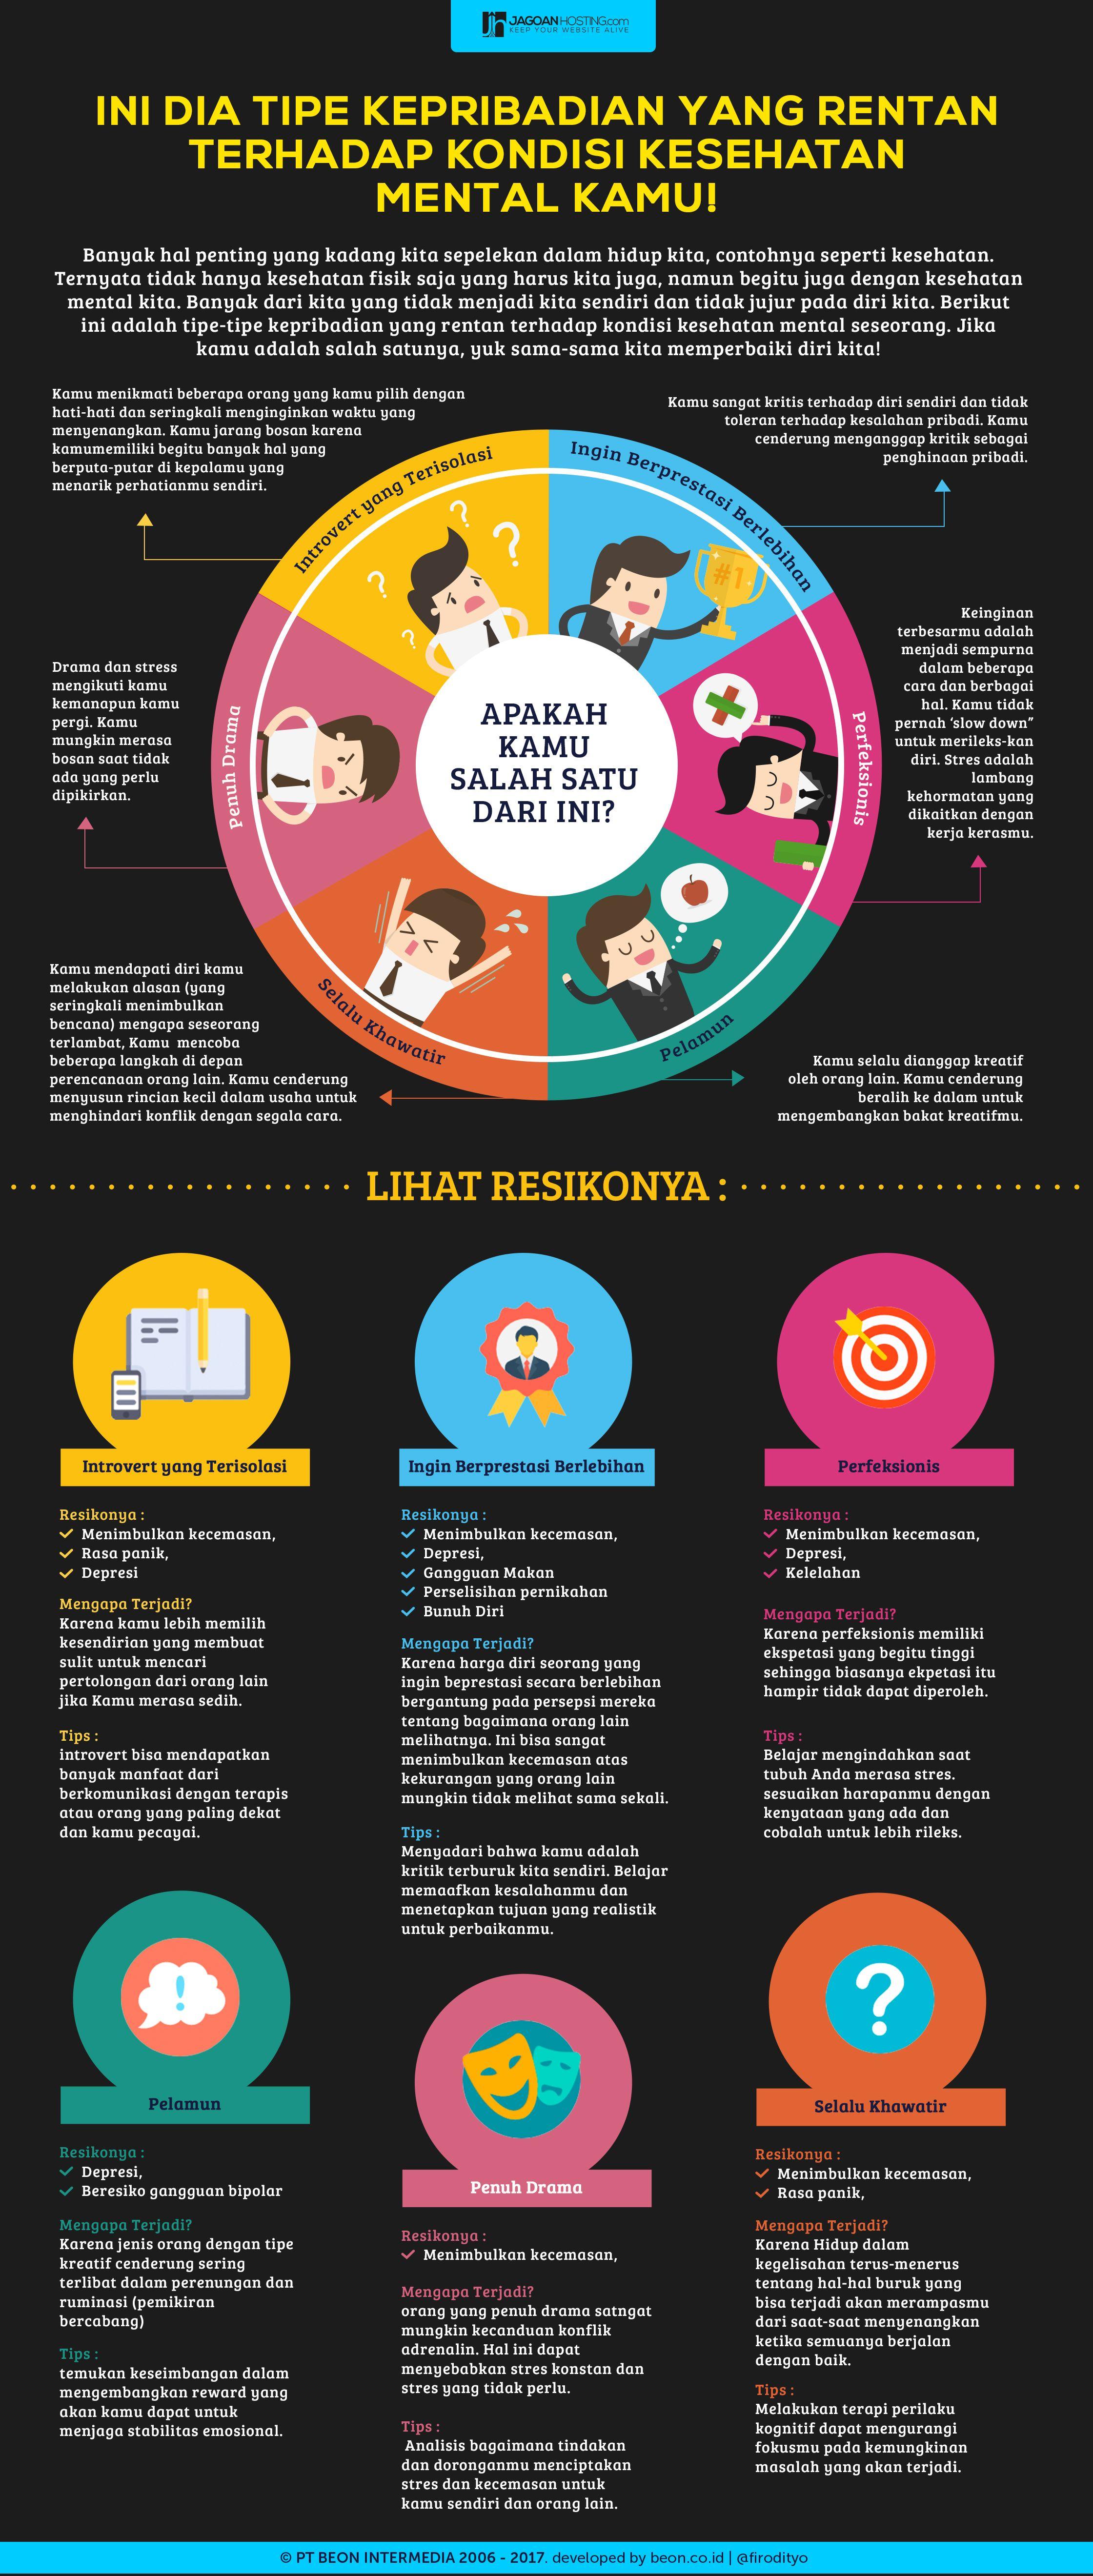 Infografis Psikologi Kepibadian Yang Rentan Terhadap Kesehatan Mental Kesehatan Mental Psikologi Infografis